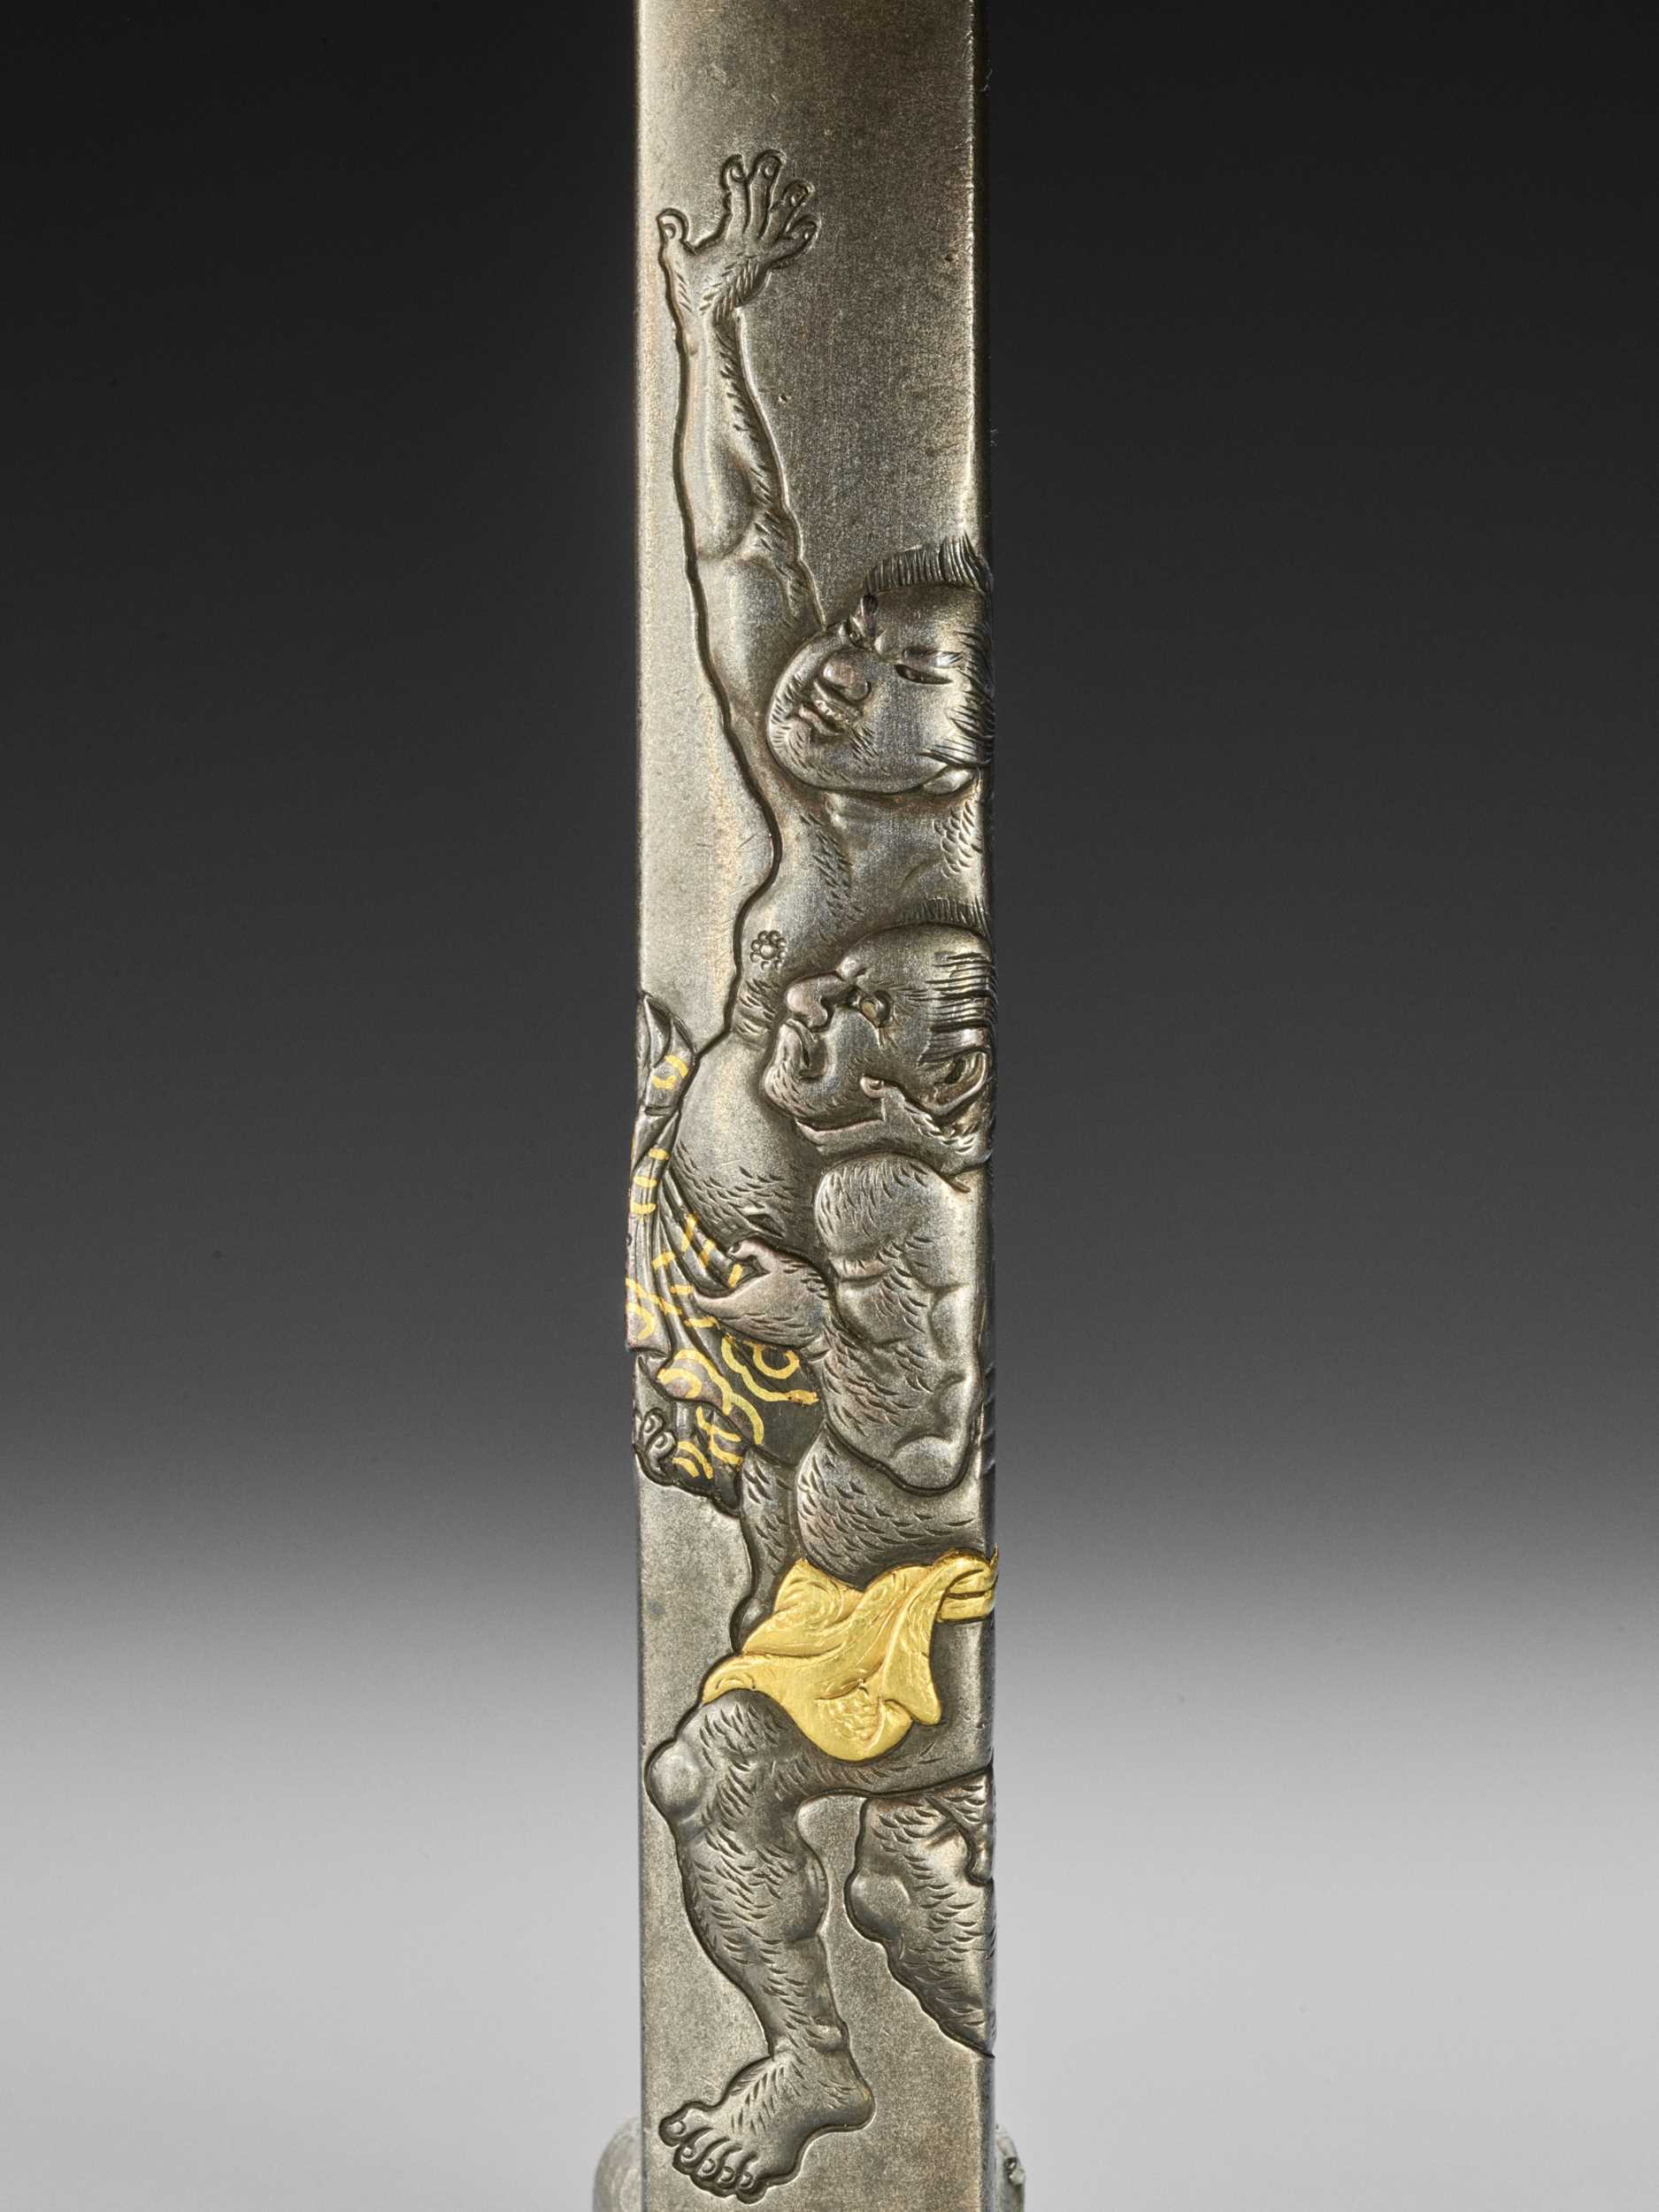 Lot 47 - HAMANO NAOYUKI: A GOLD-INLAID SHIBUICHI KOZUKA WITH TWO SUMO WRESTLERS